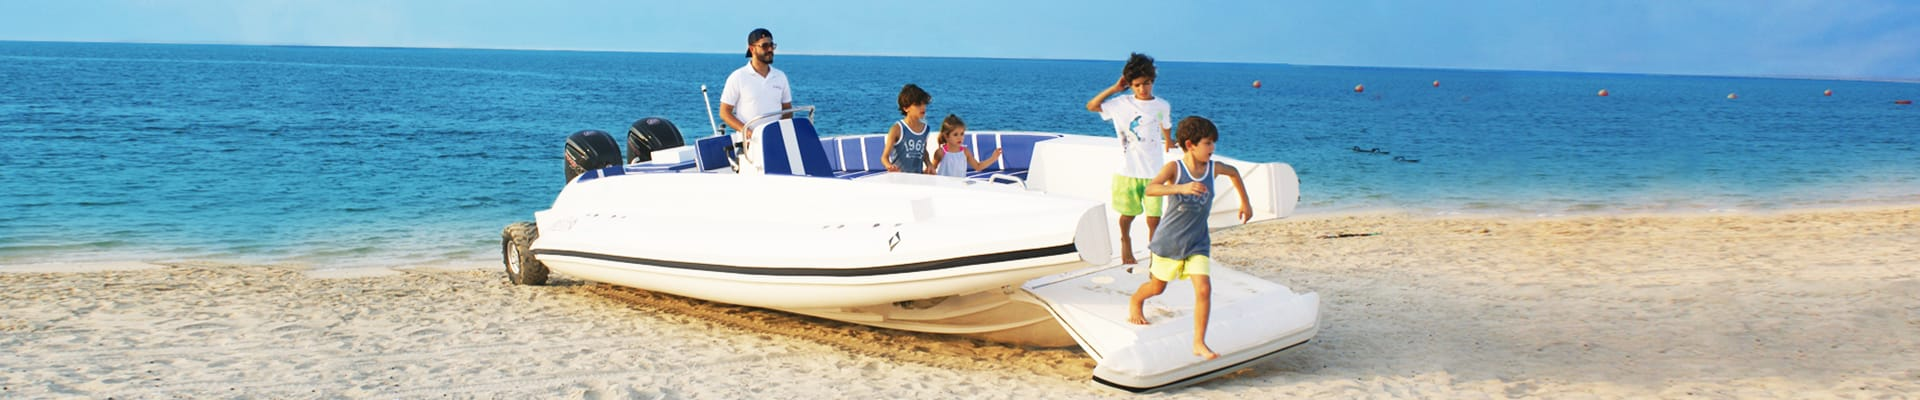 tender-amphibious-9.5m-beachlander-header